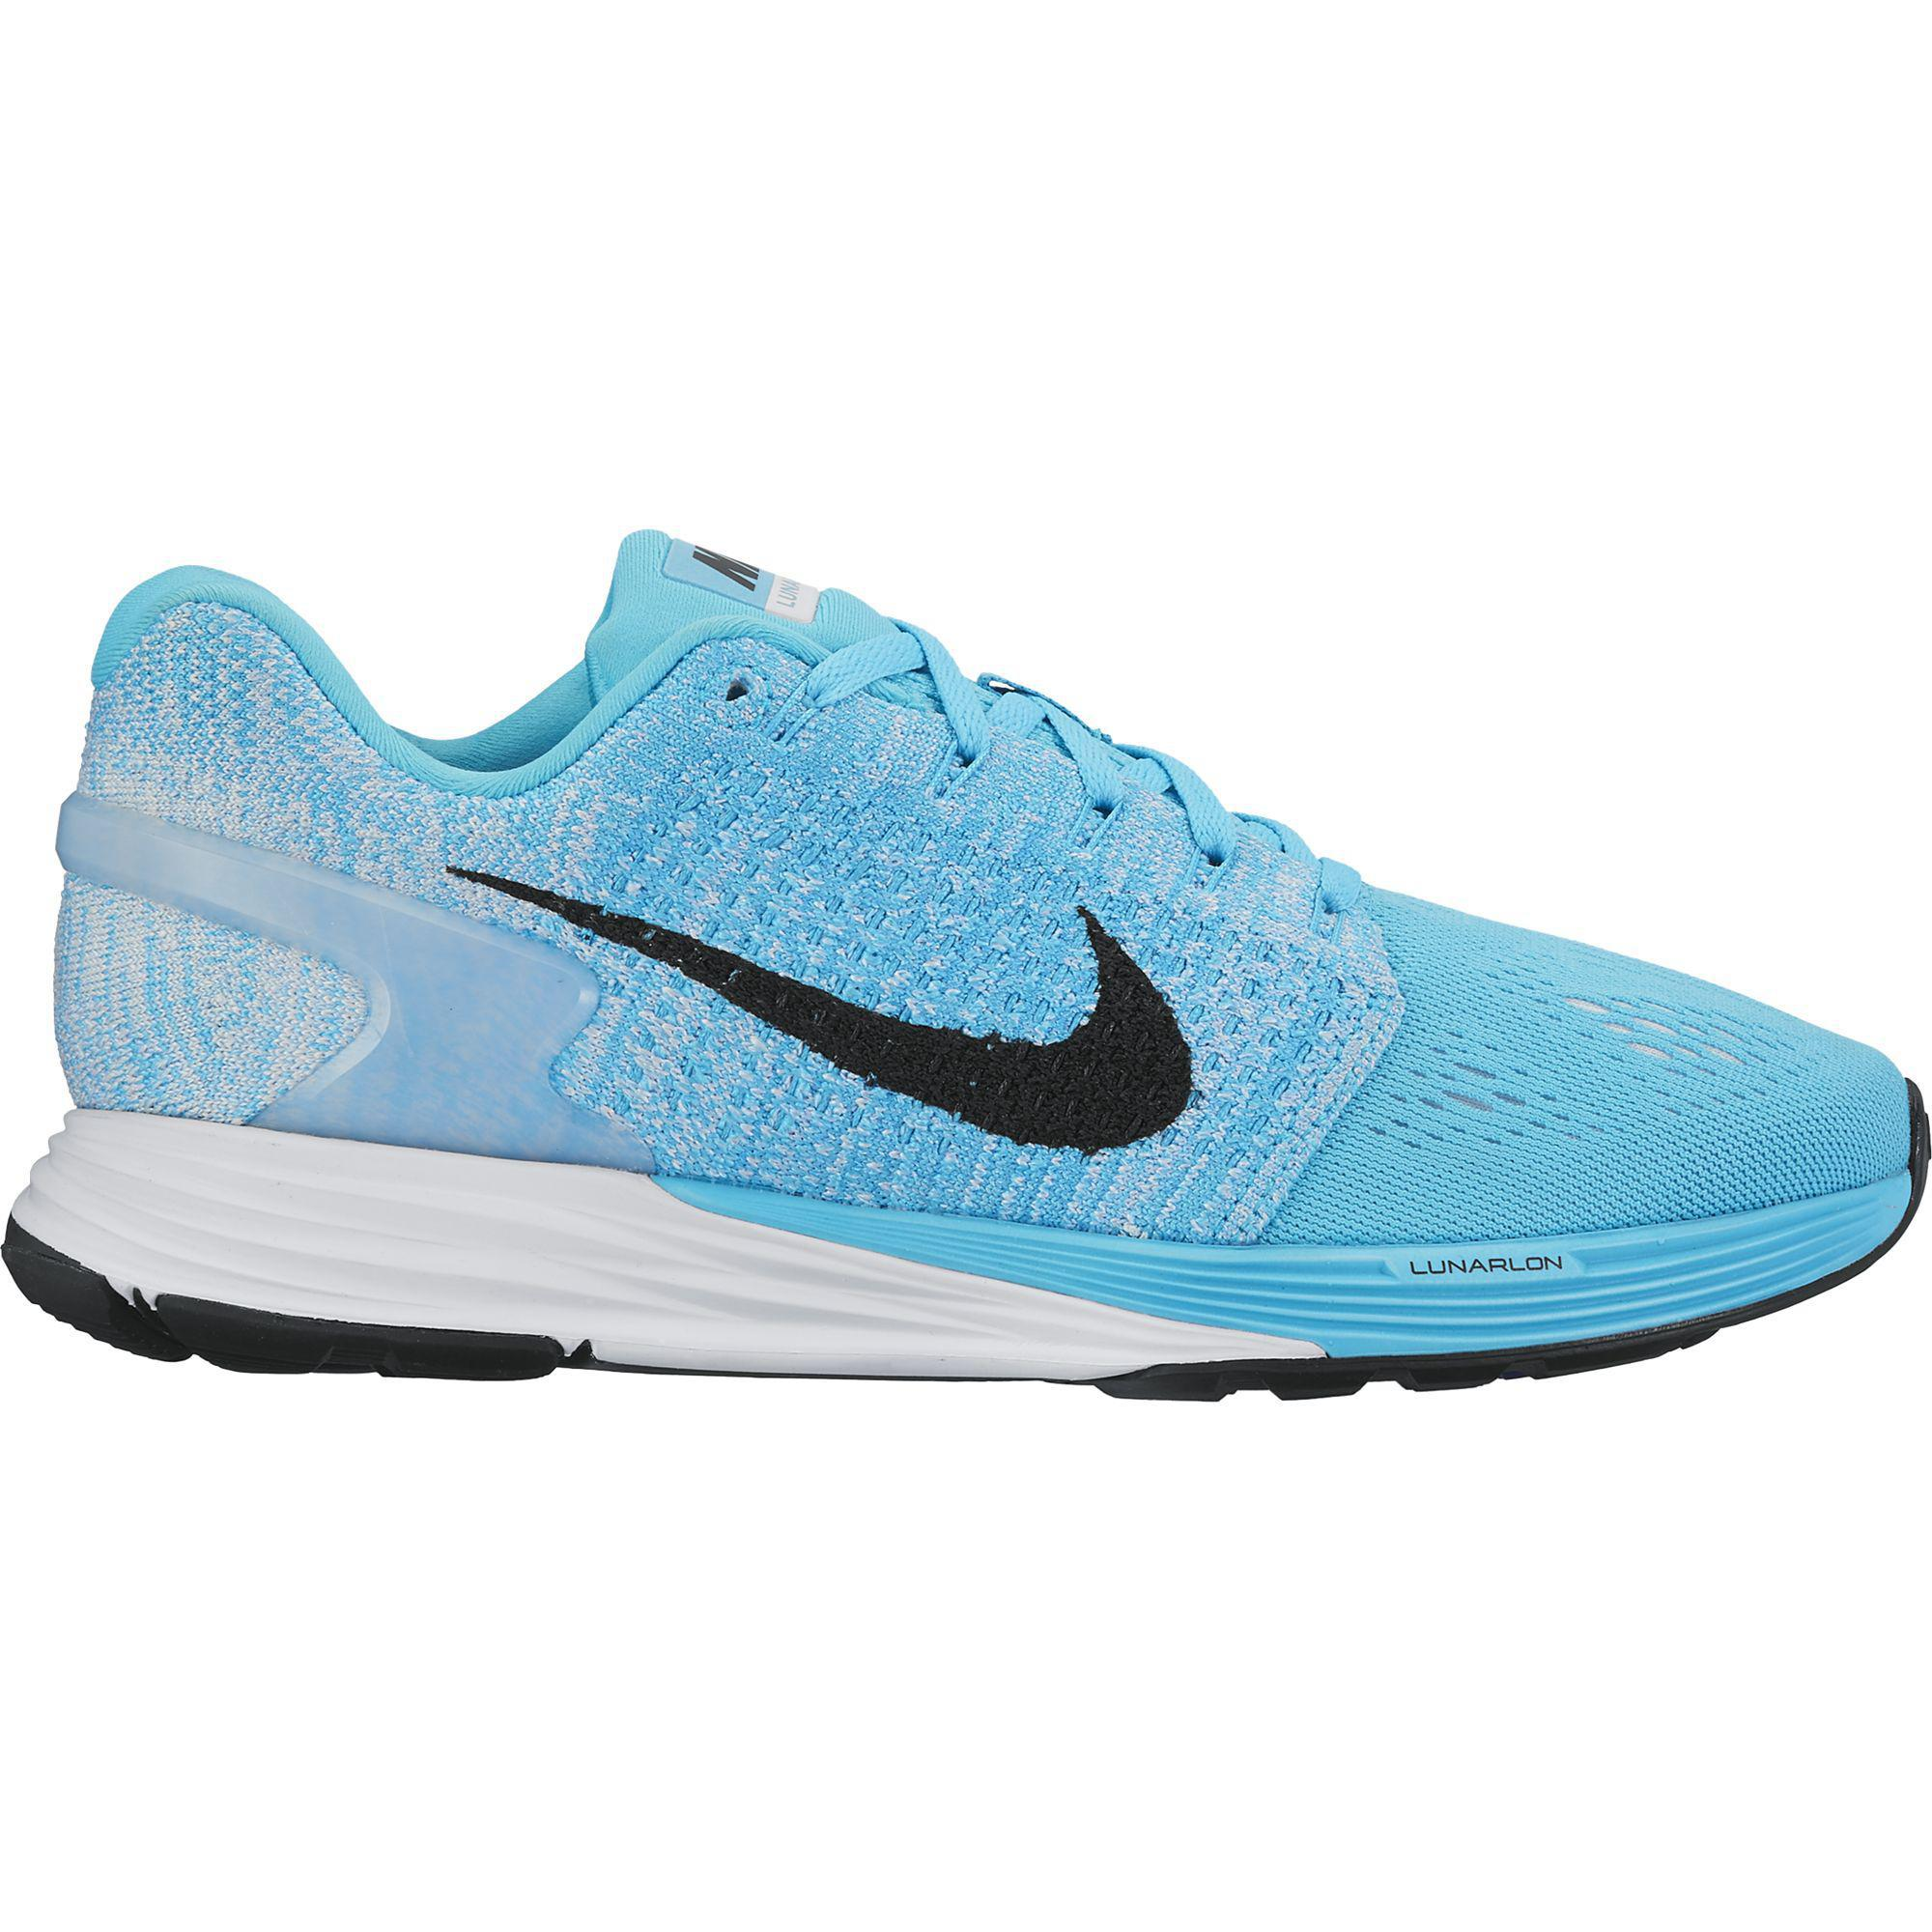 Nike Lunarglide Shoes